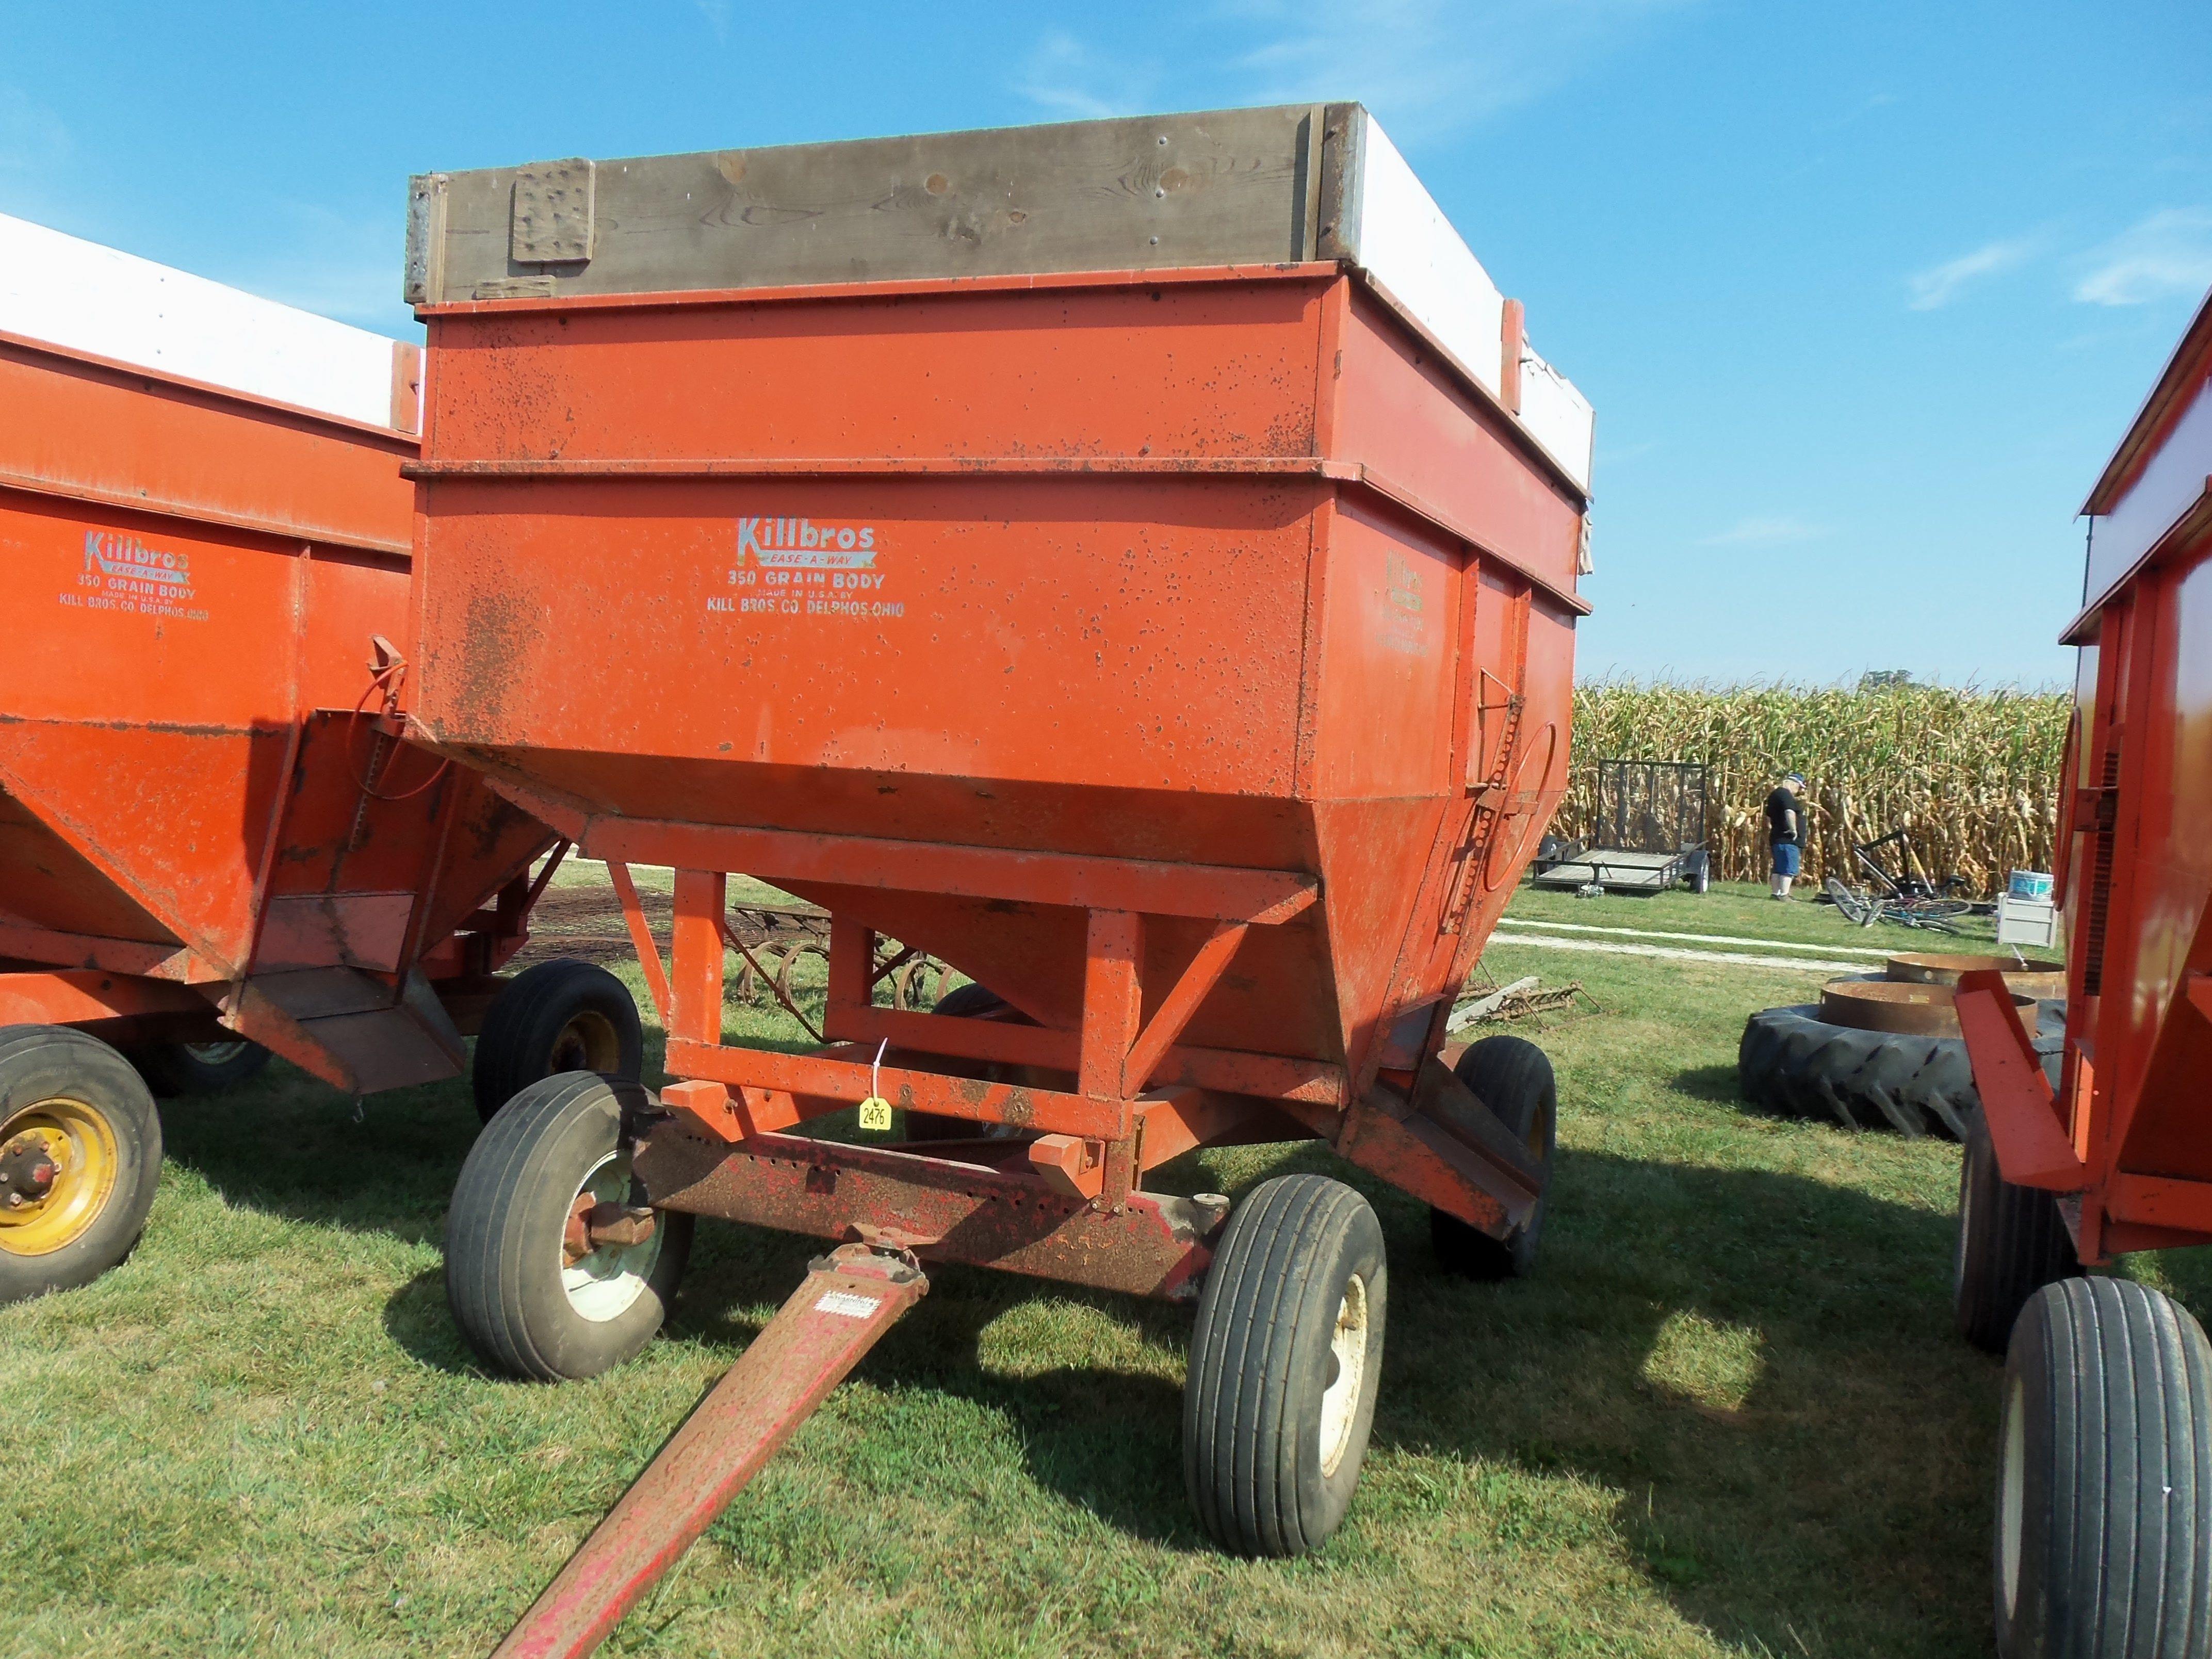 Orange KillBros 350 gravity cart